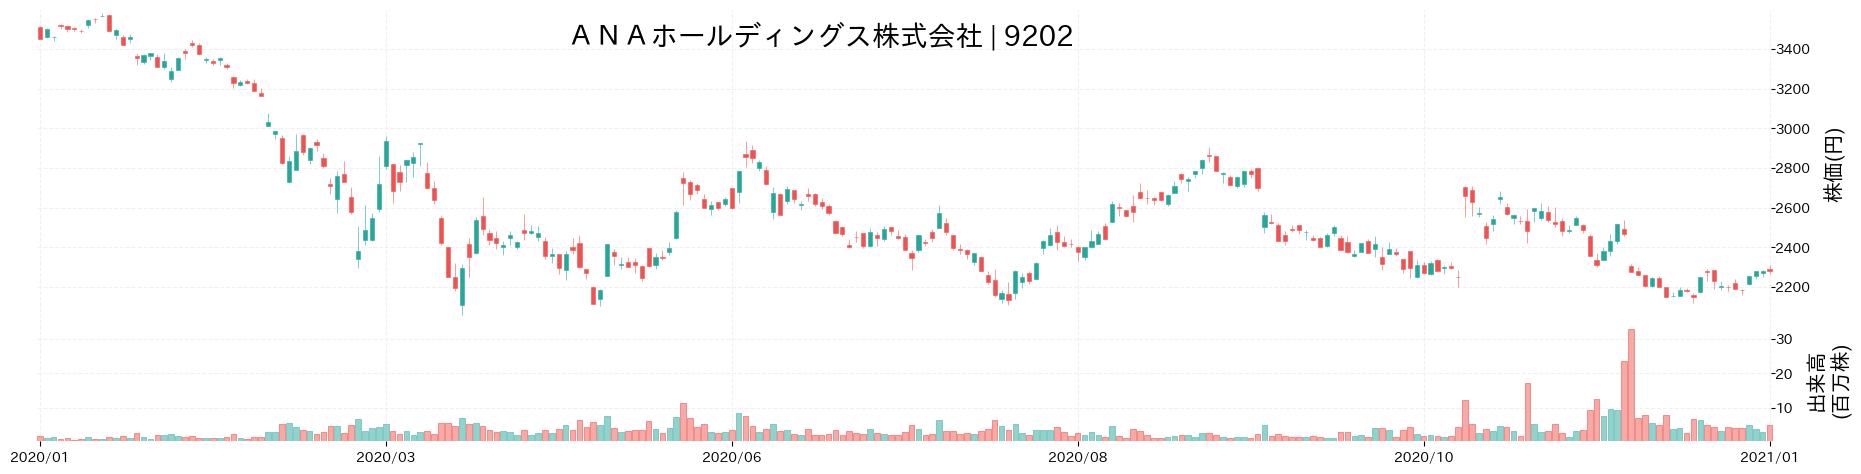 ANAホールディングス株式会社の株価推移(2020)